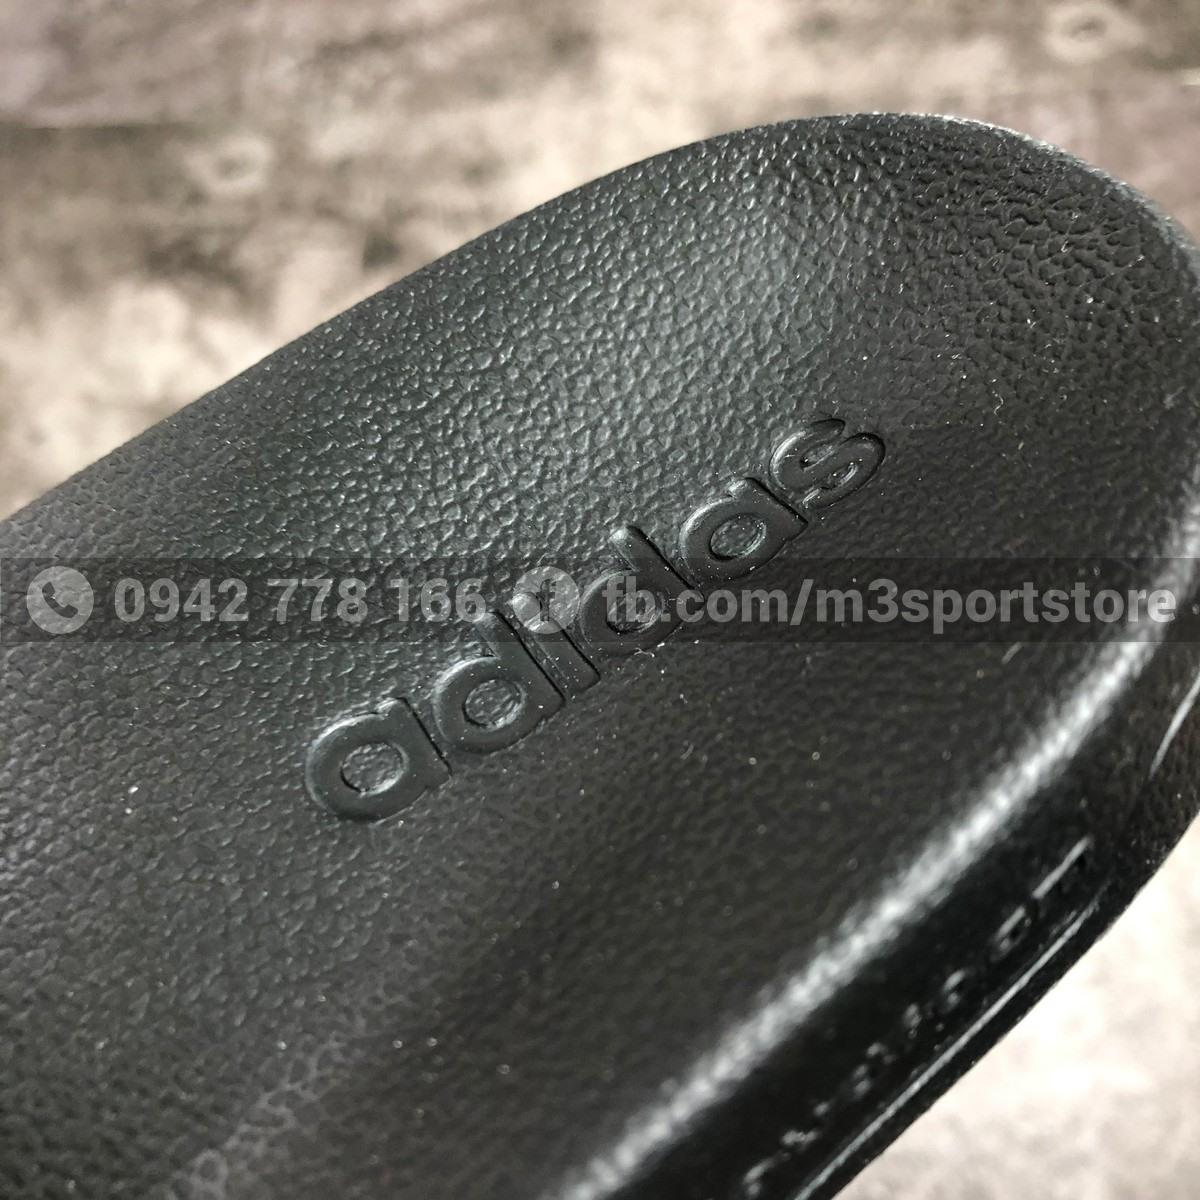 Dép thể thao nam Adidas  Adilette Shower FW7075